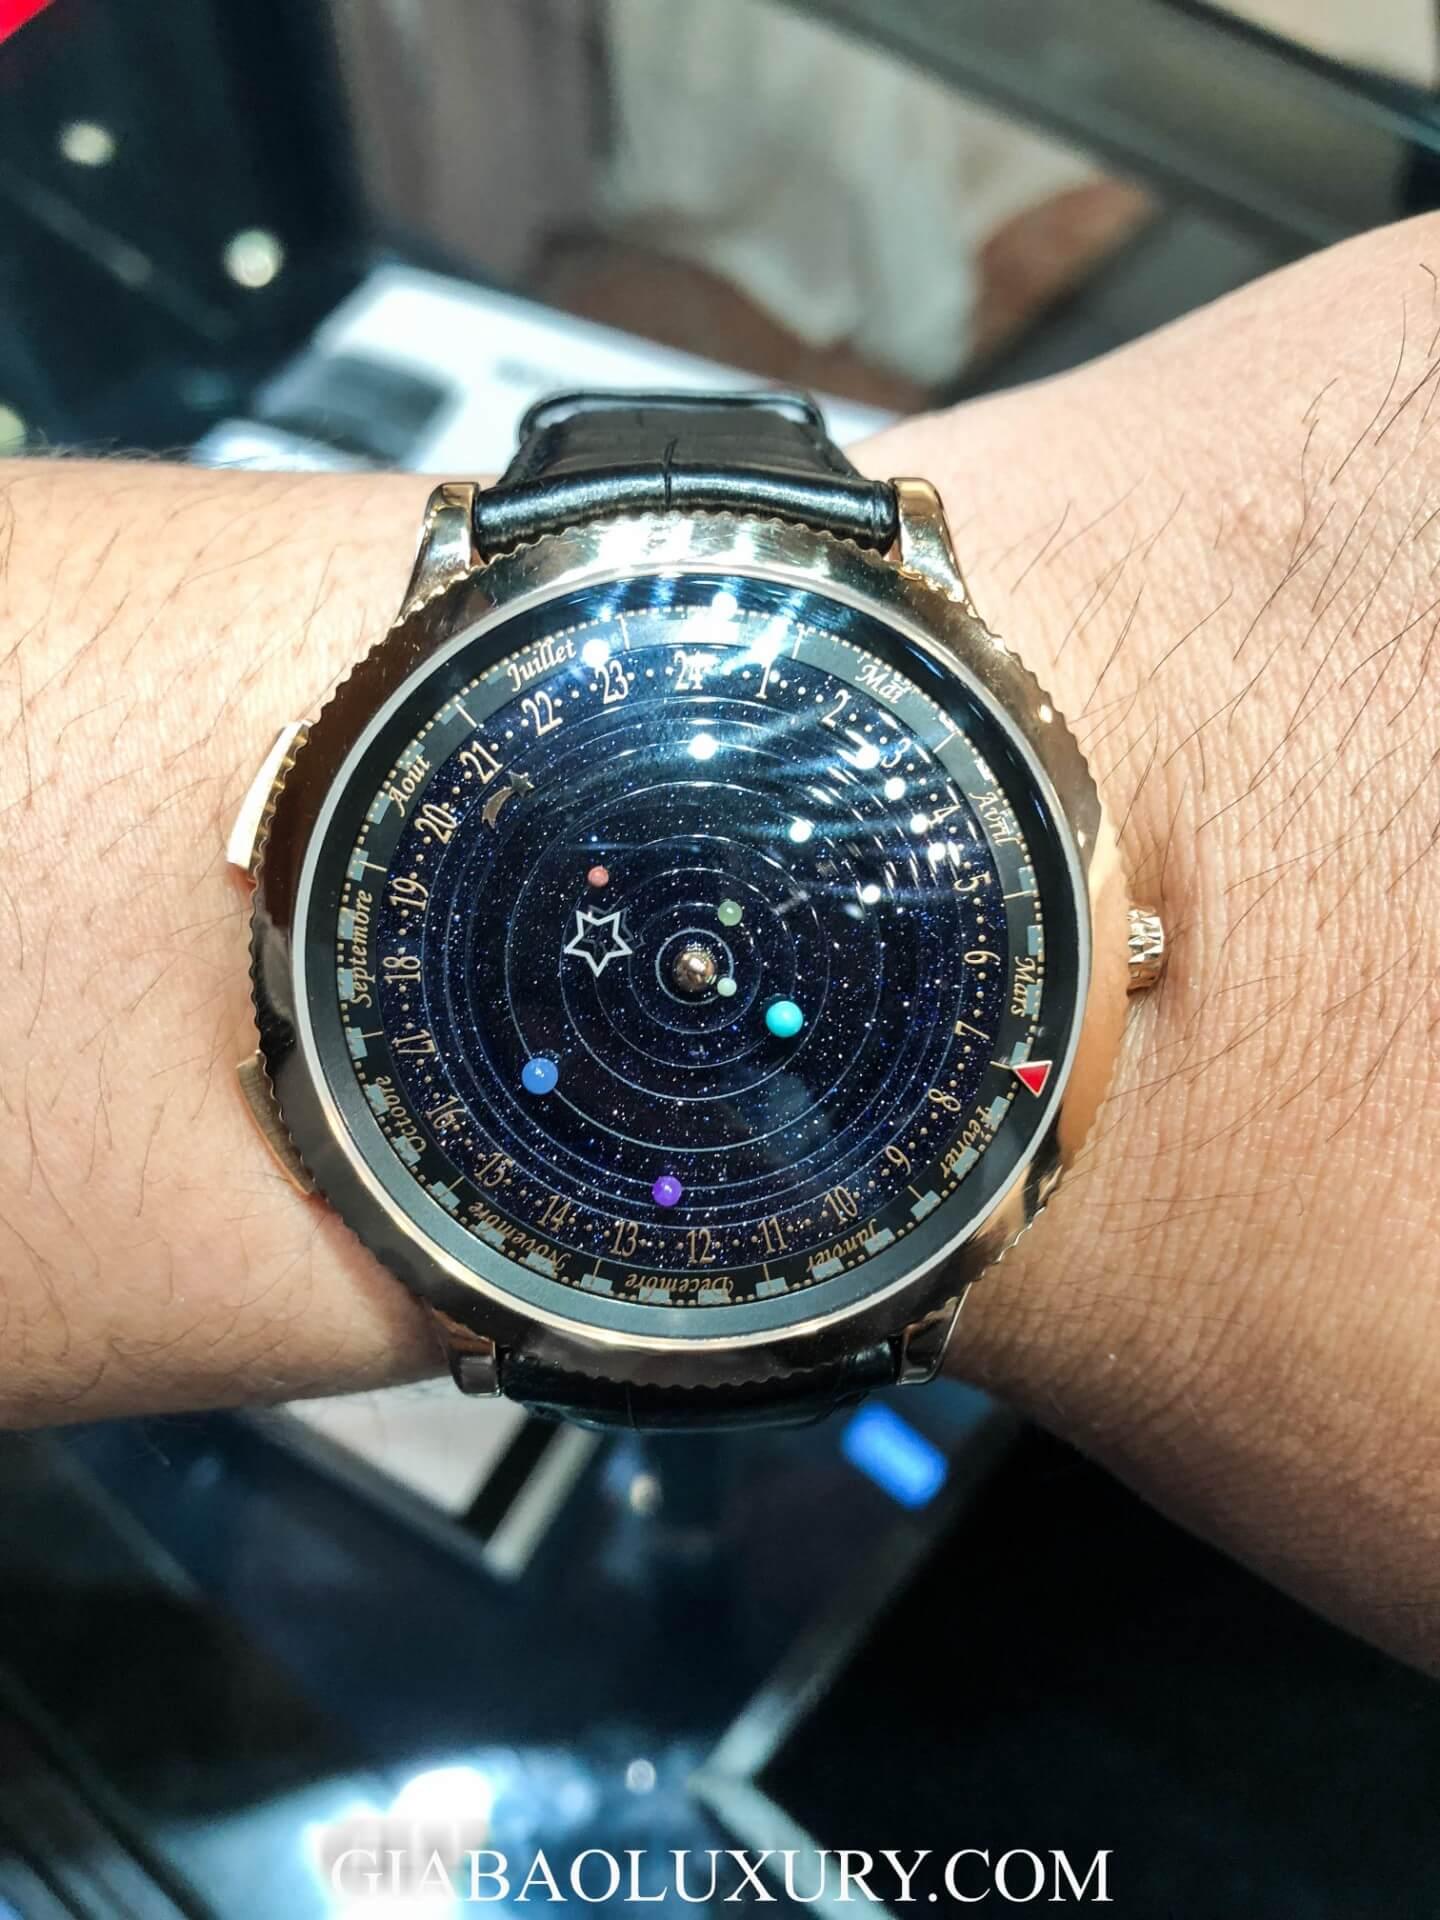 Đồng Hồ Van Cleef & Arpels Midnight Planétarium VCARO4J000